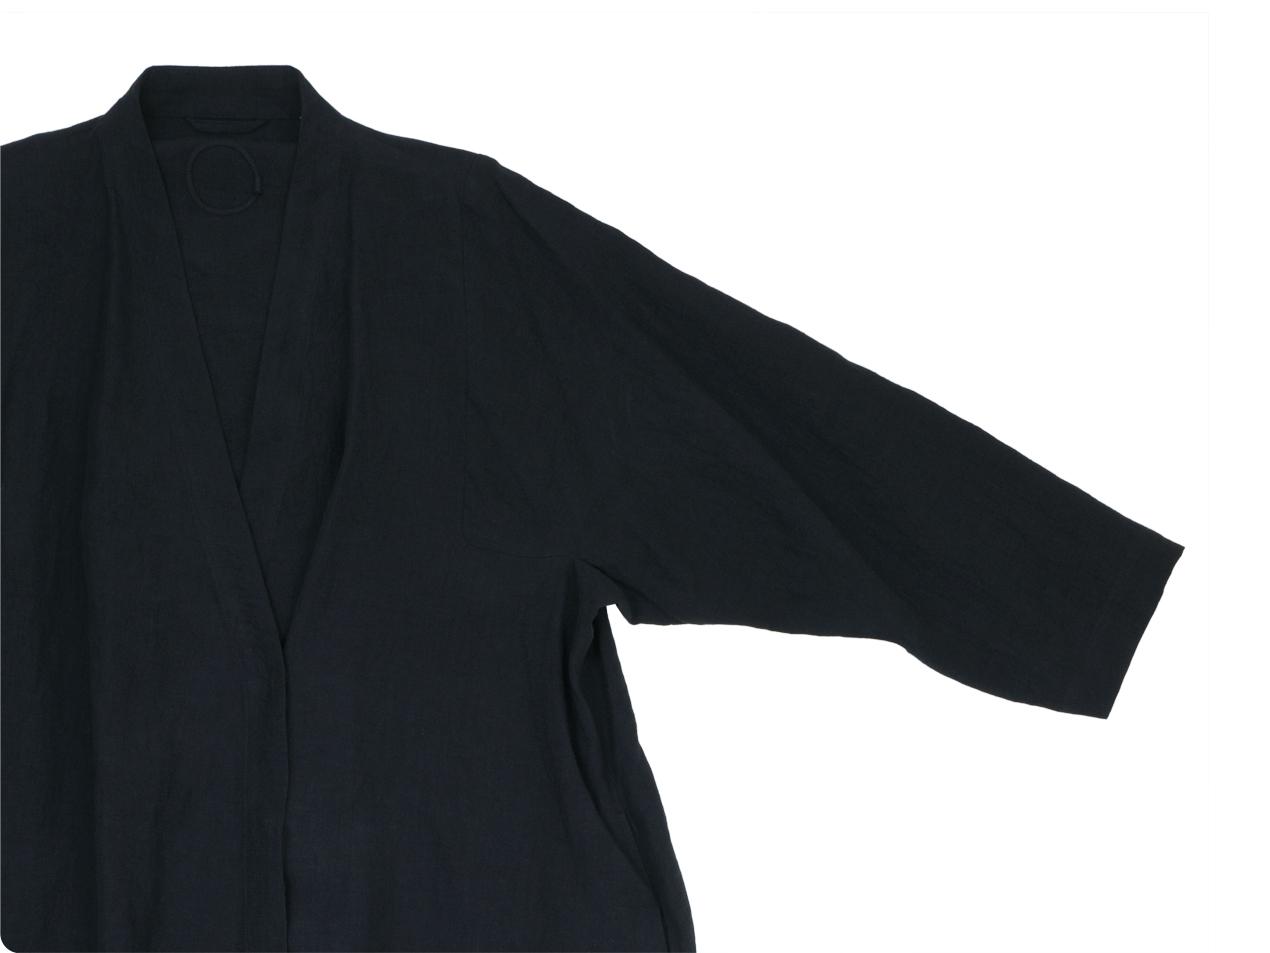 Atelier d'antan Valery(ヴァレリー) Coat